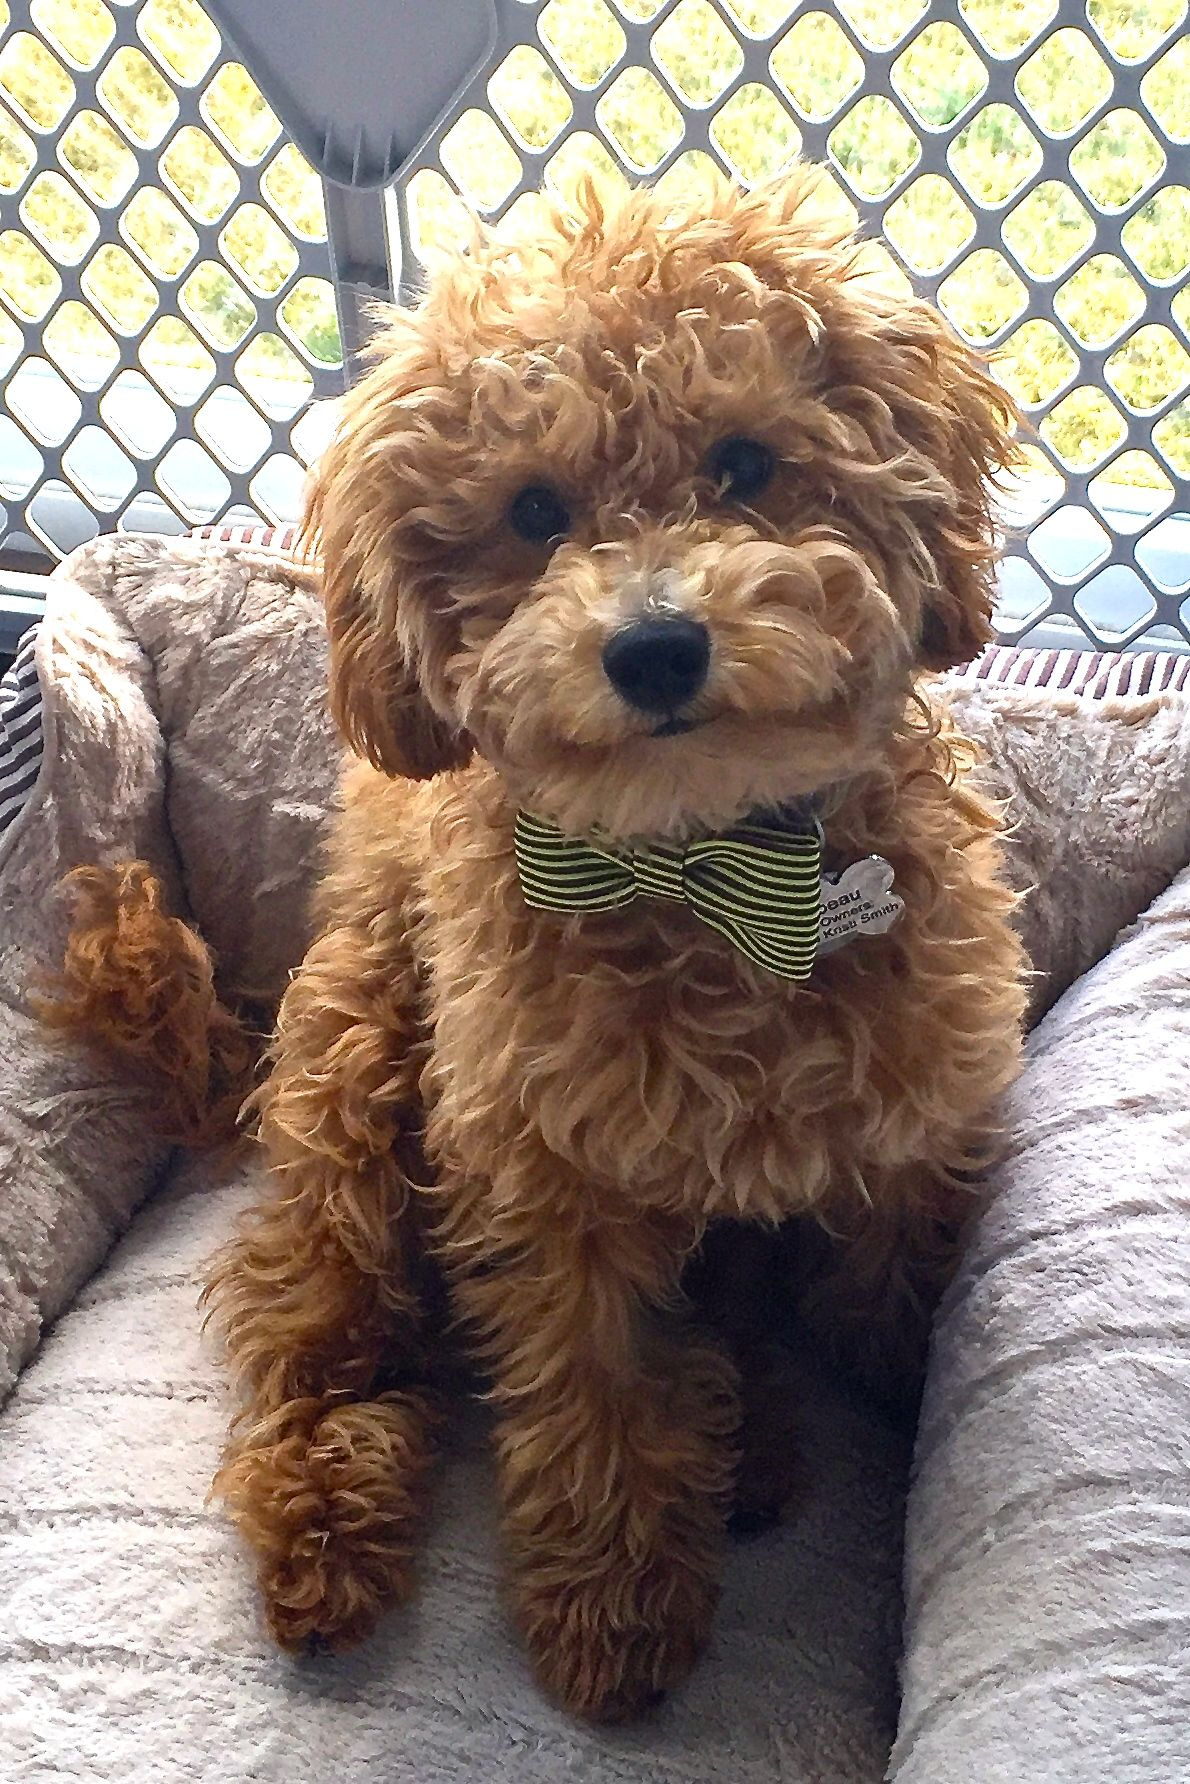 My Handsome Apricot Mini Poodle Puppy Lambeau Poodle Puppy